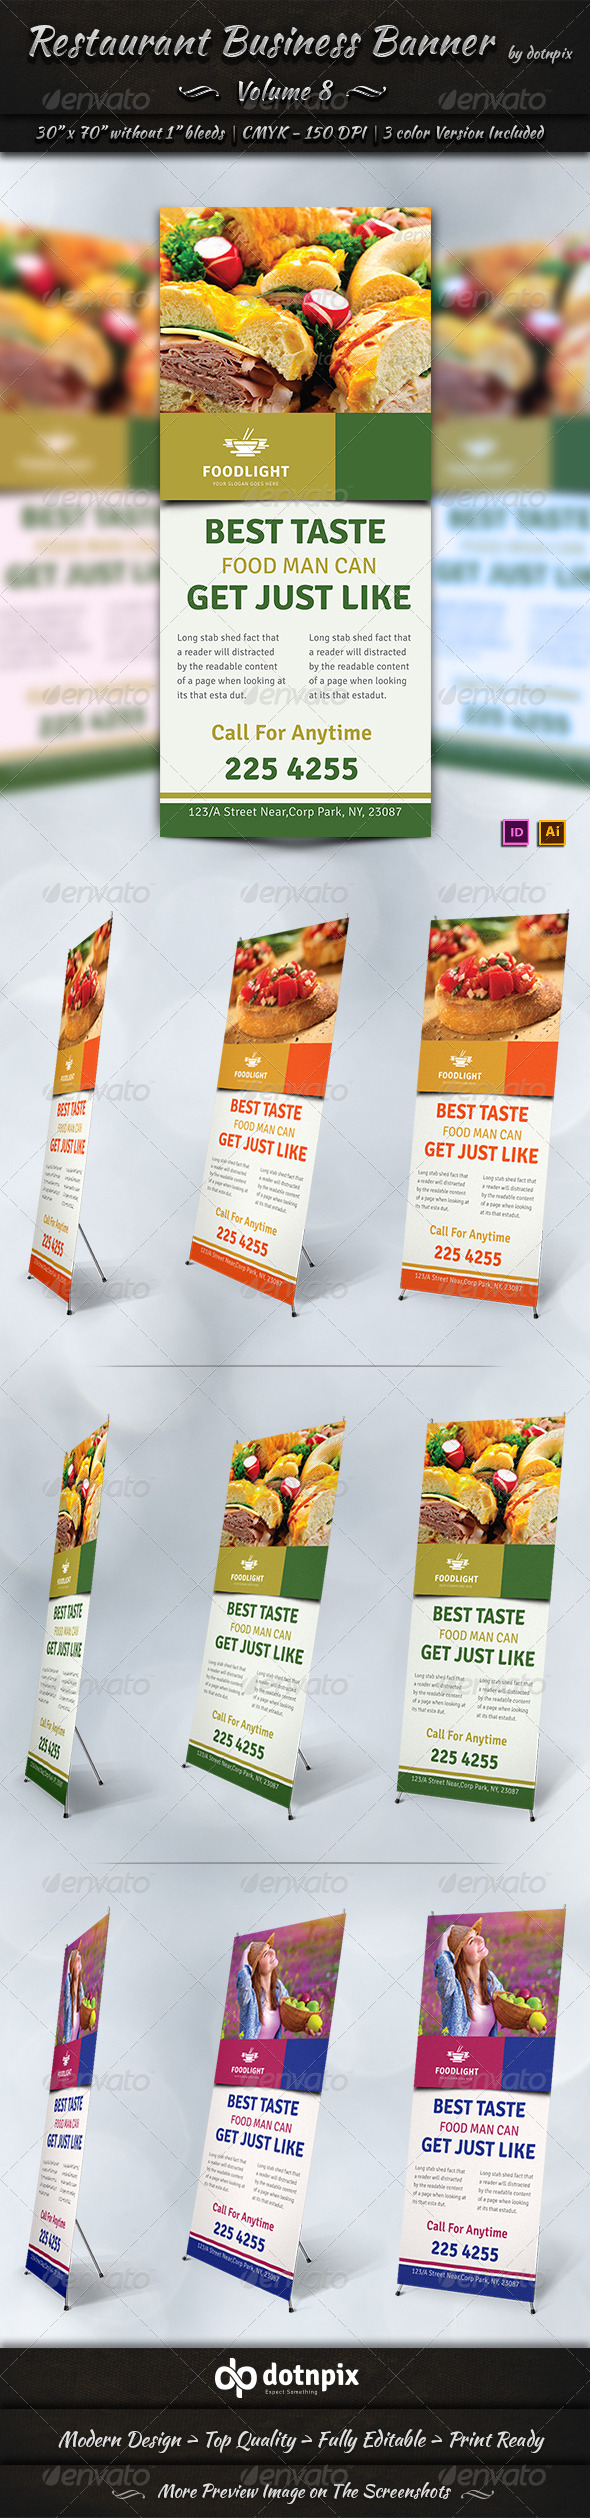 GraphicRiver Restaurant Business Banner Volume 8 7796837